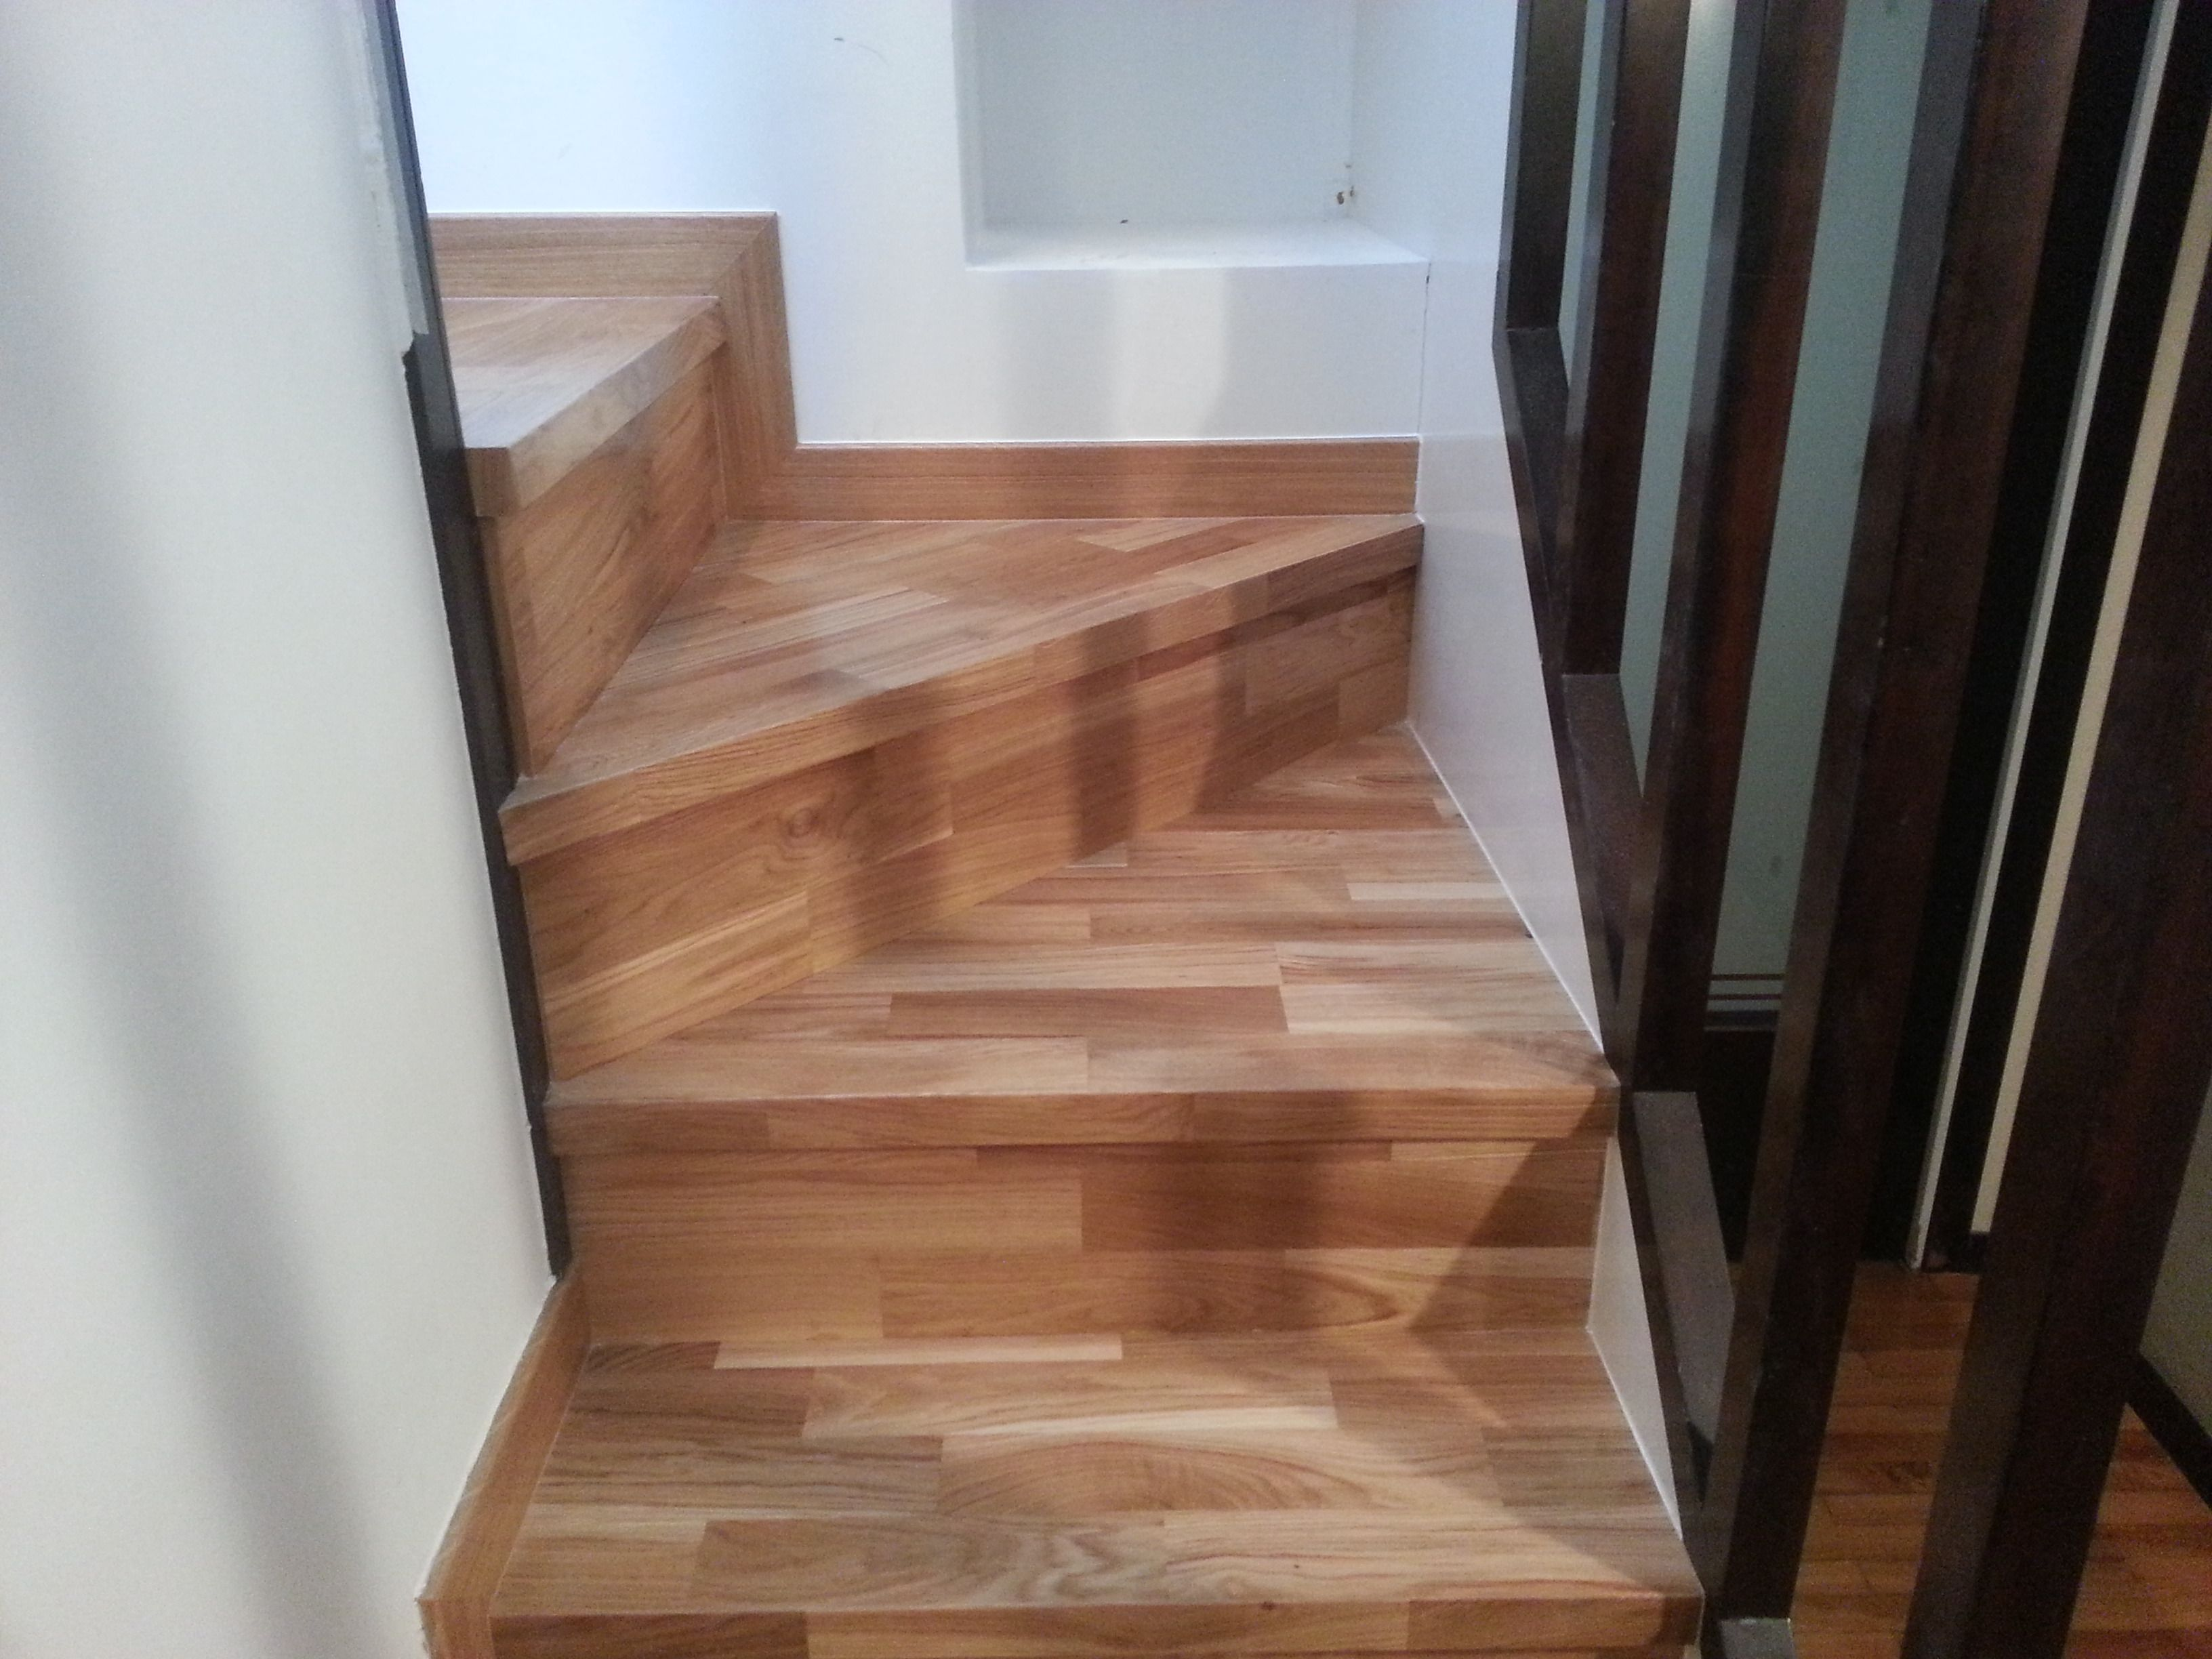 Acuchillar O Restaurar Una Escalera De Madera Escaleras Escaleras De Madera Escaleras Interiores